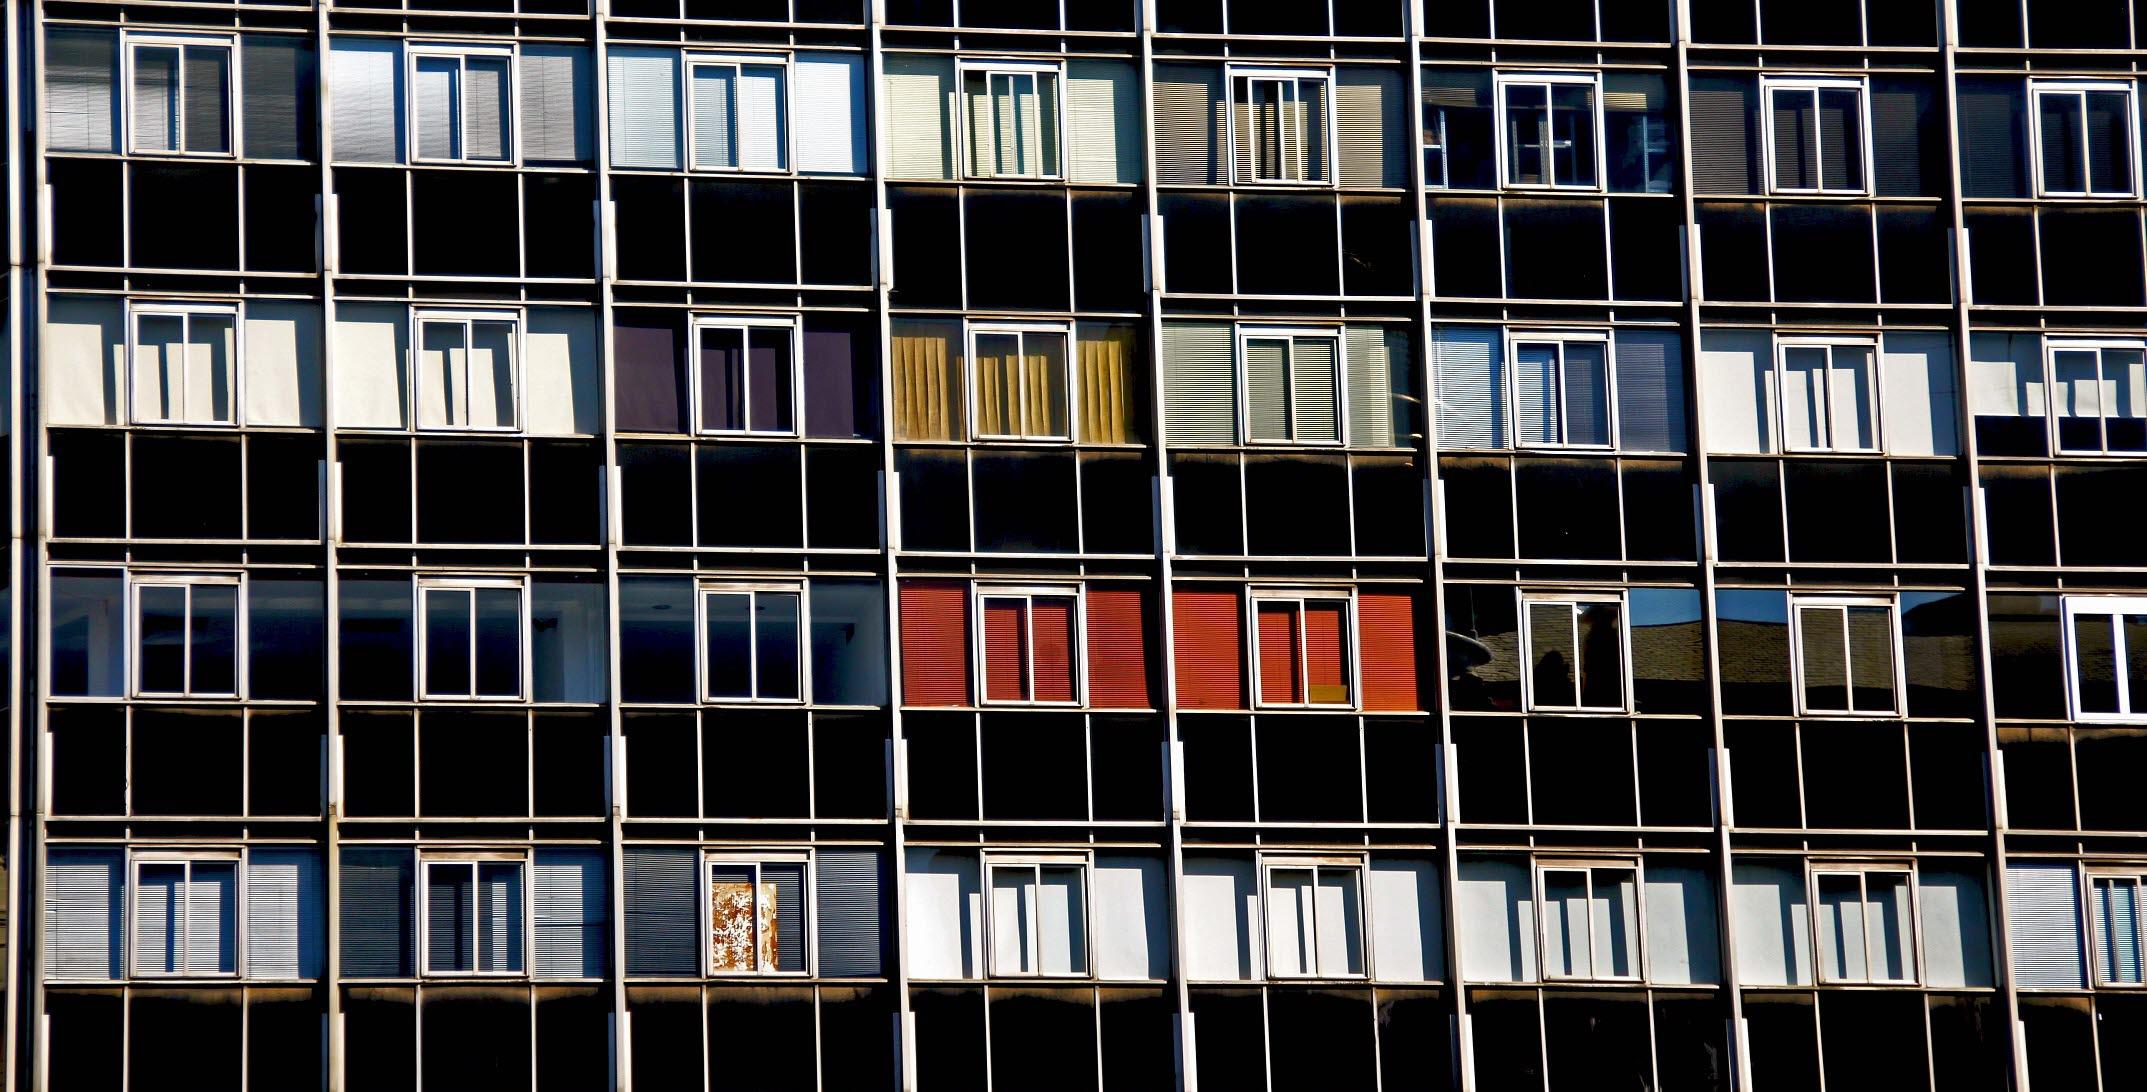 Apartment block, Housing, Pexels, 050718, mb